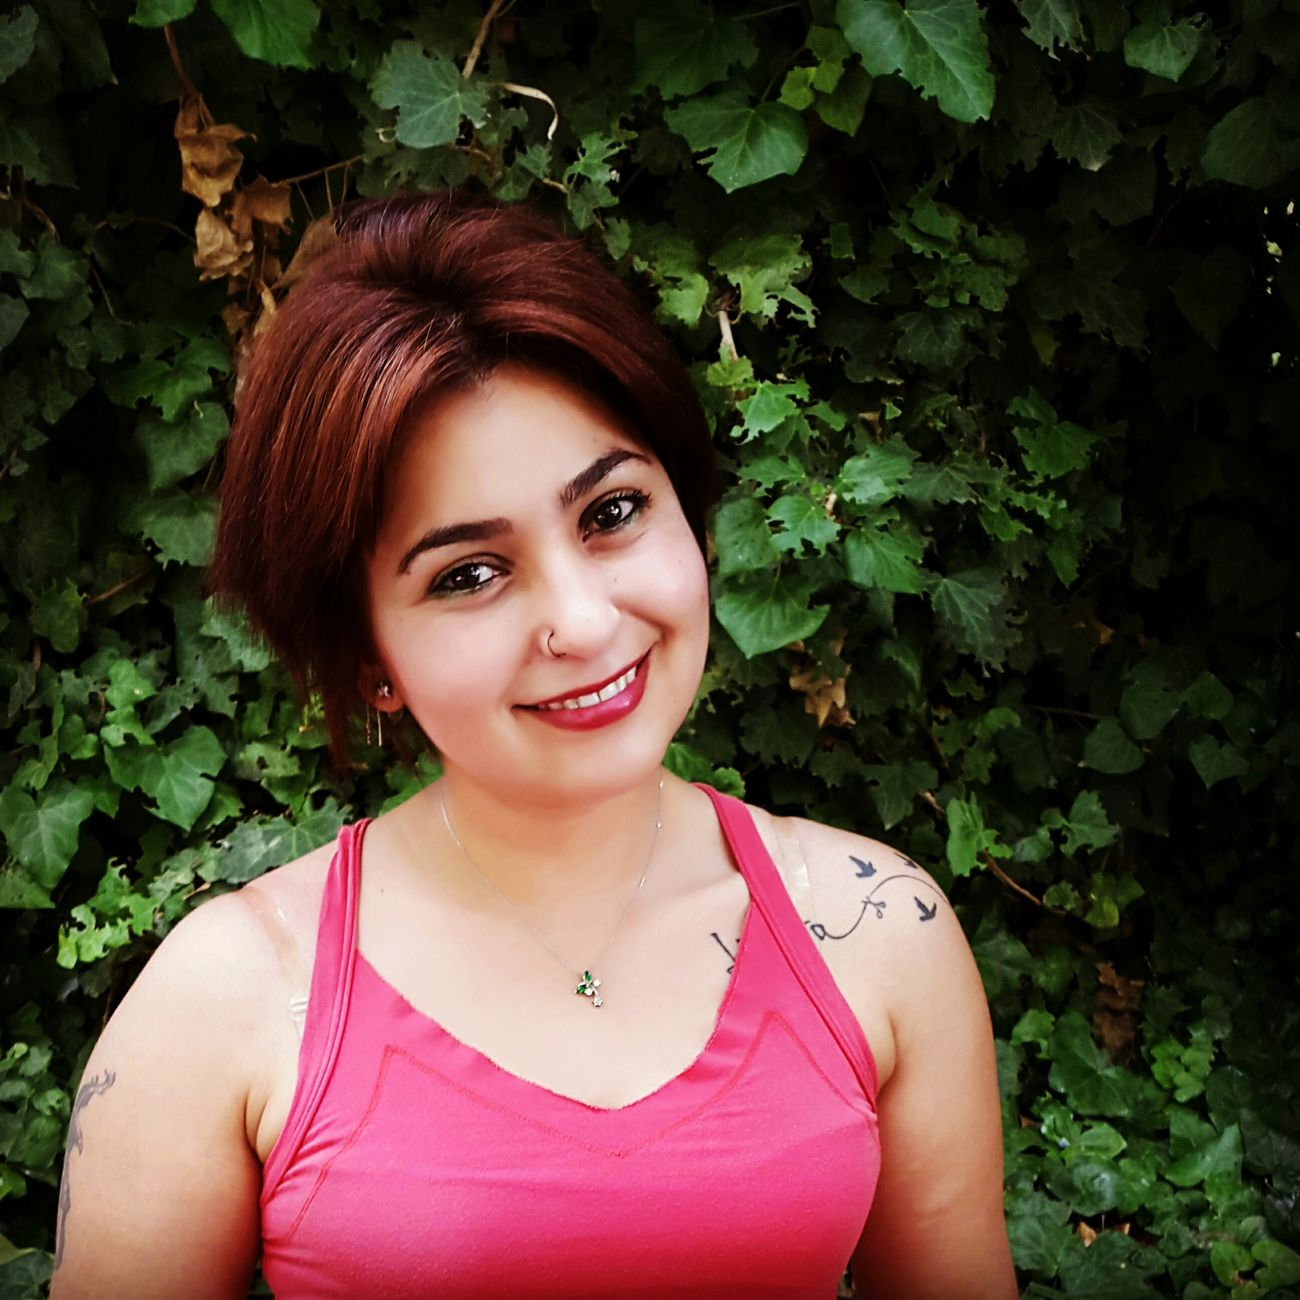 Renk Ahenk Antalya Siirsokakta Frida Yeşil